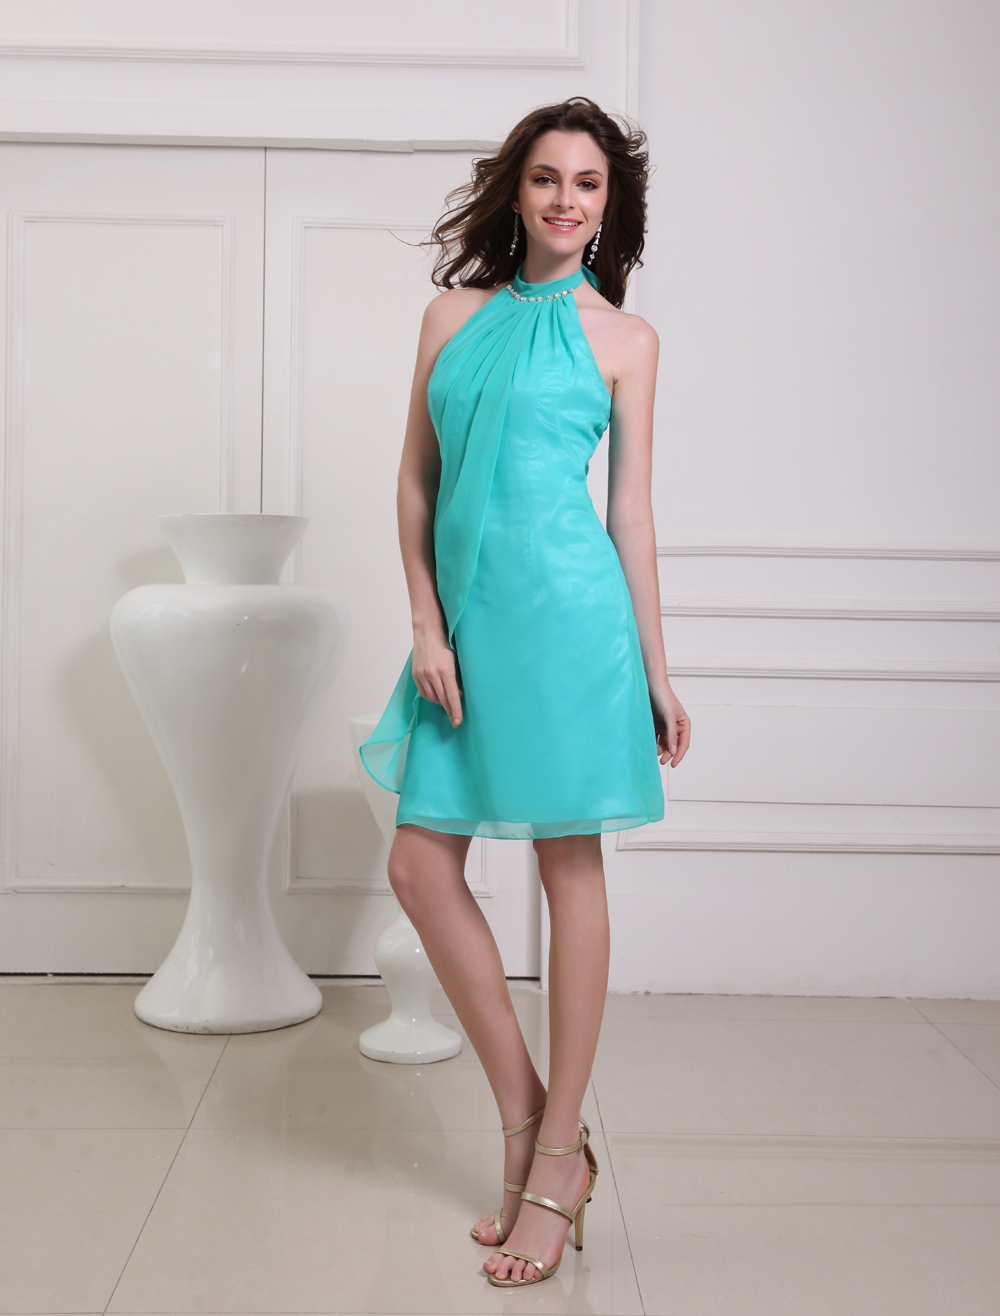 Green Halter A-line Bow Chiffon Pretty Prom Dress (Wedding Cheap Party Dress) photo